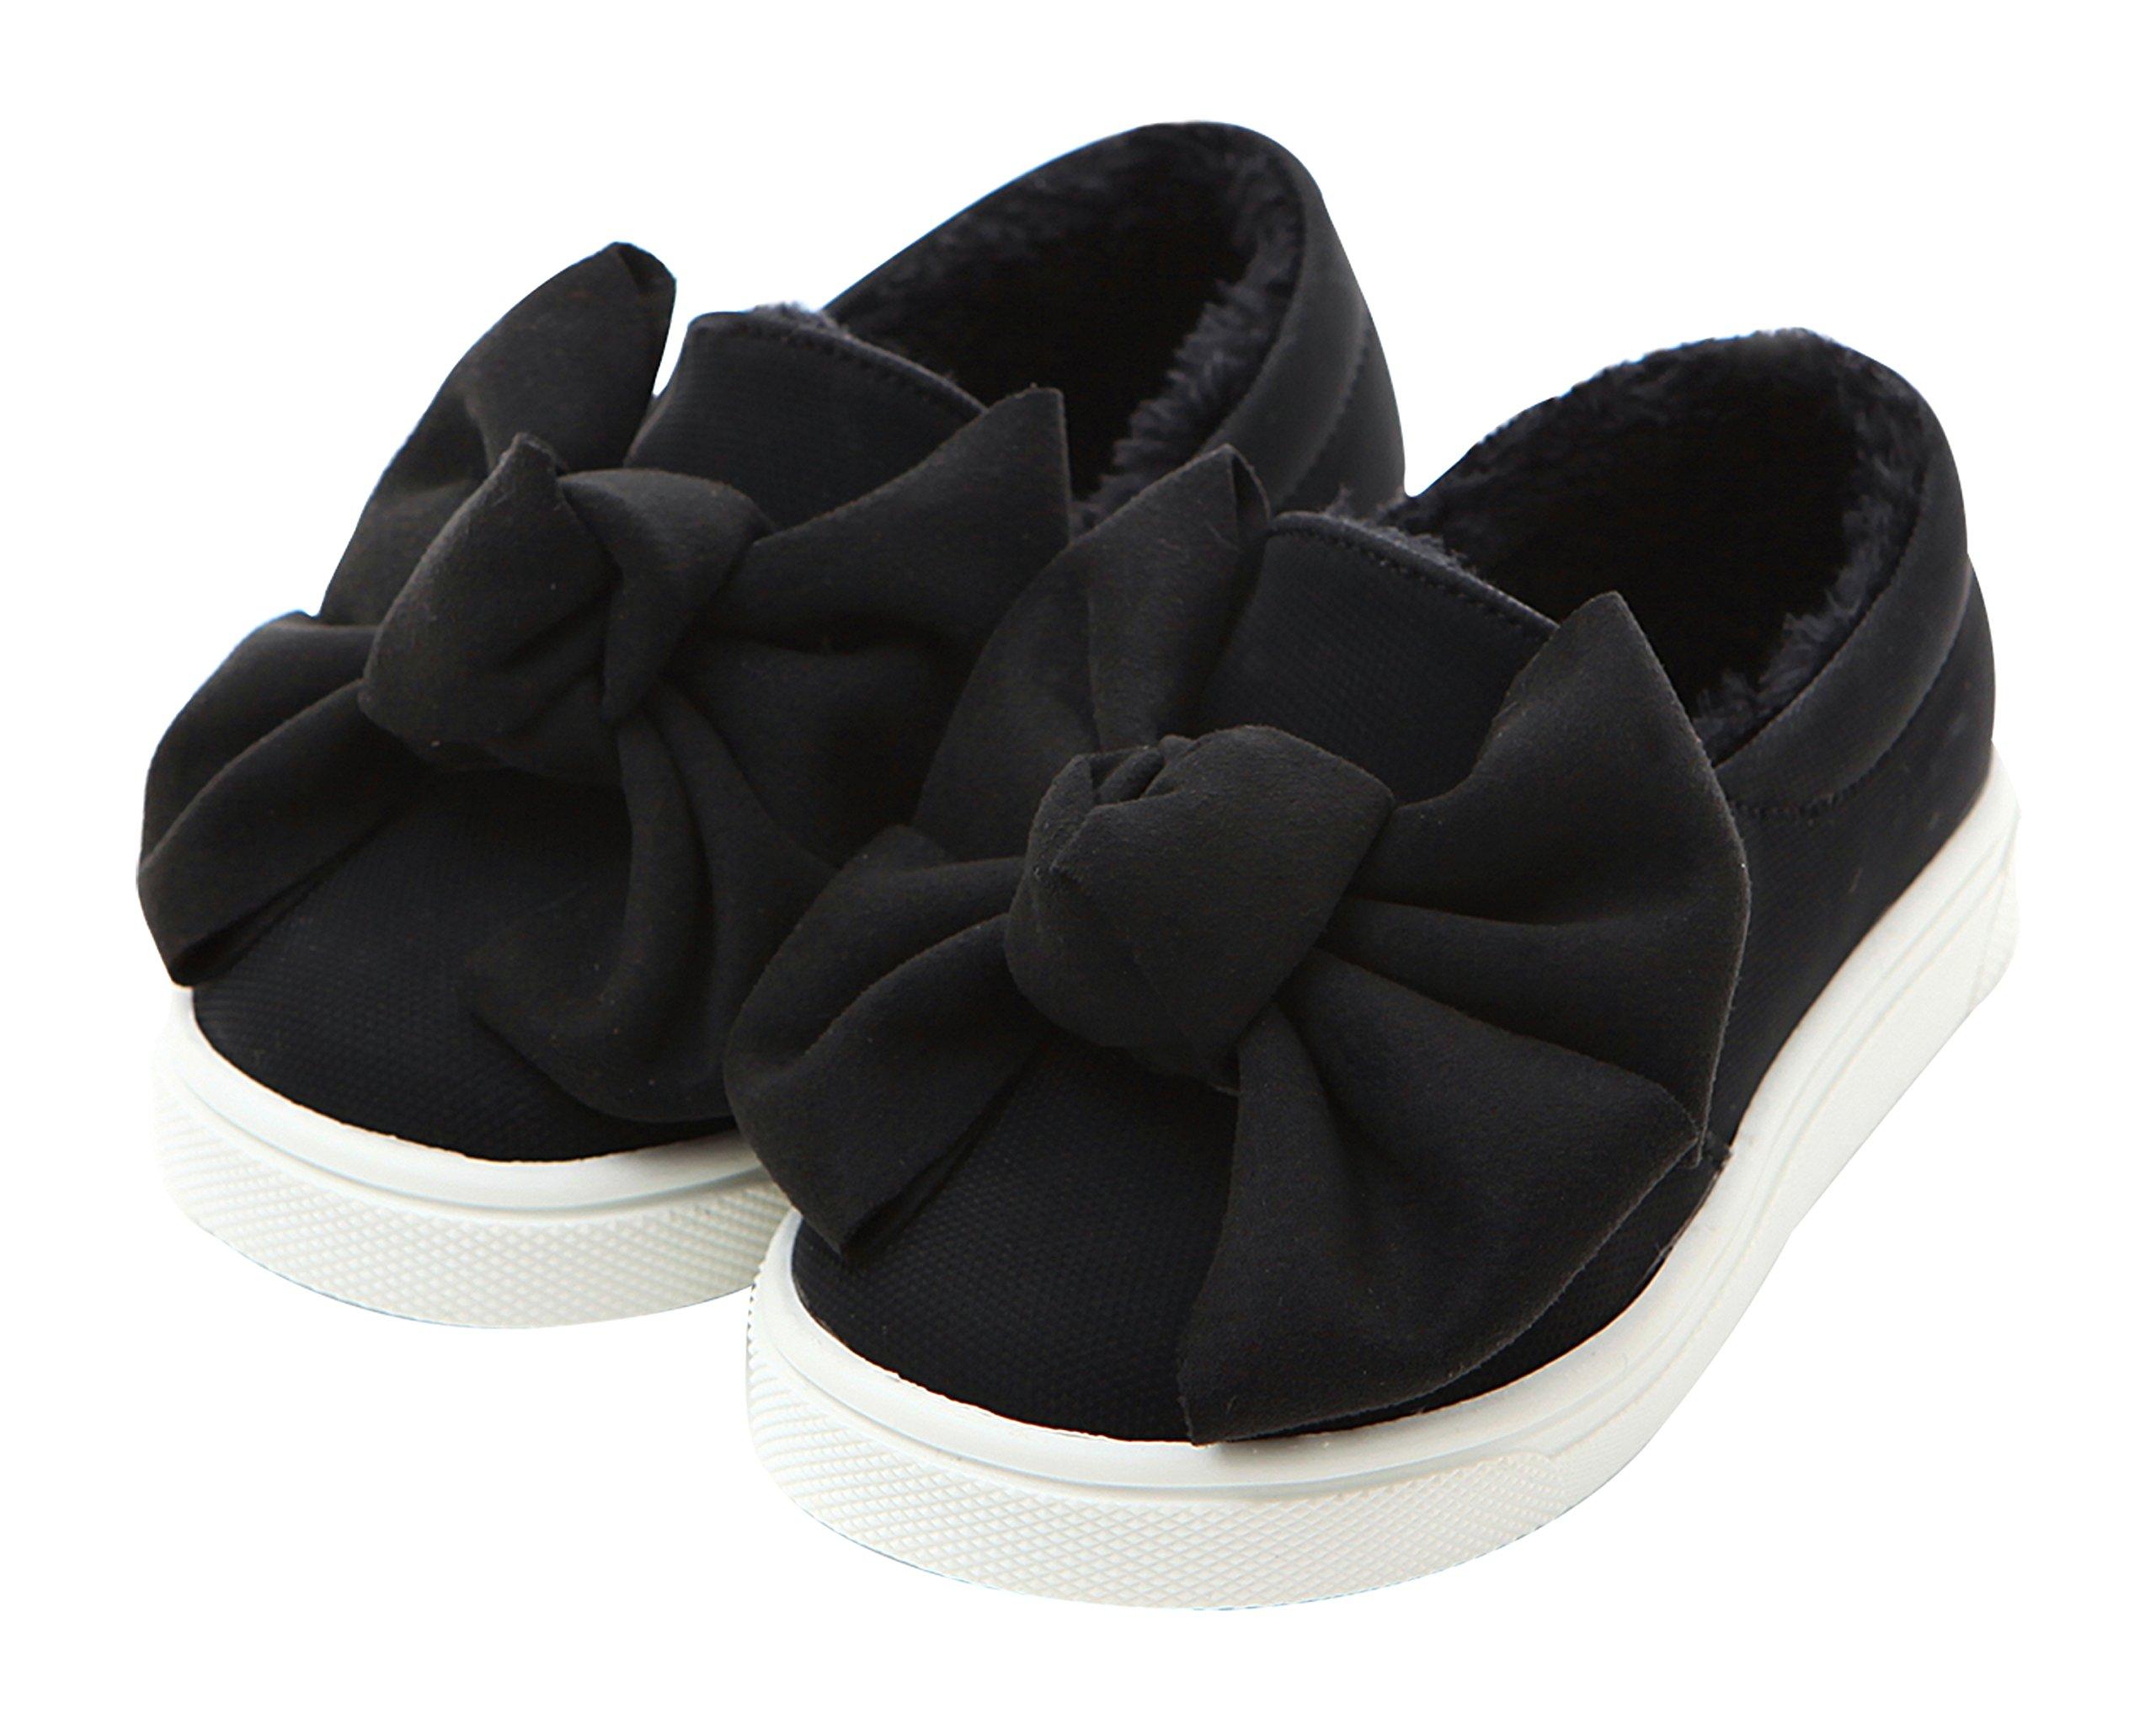 Ozkiz Little Girl's Winter Ankle Boots Warm Leather Snow Booties Slip On Sneaker Shoes BK 1M